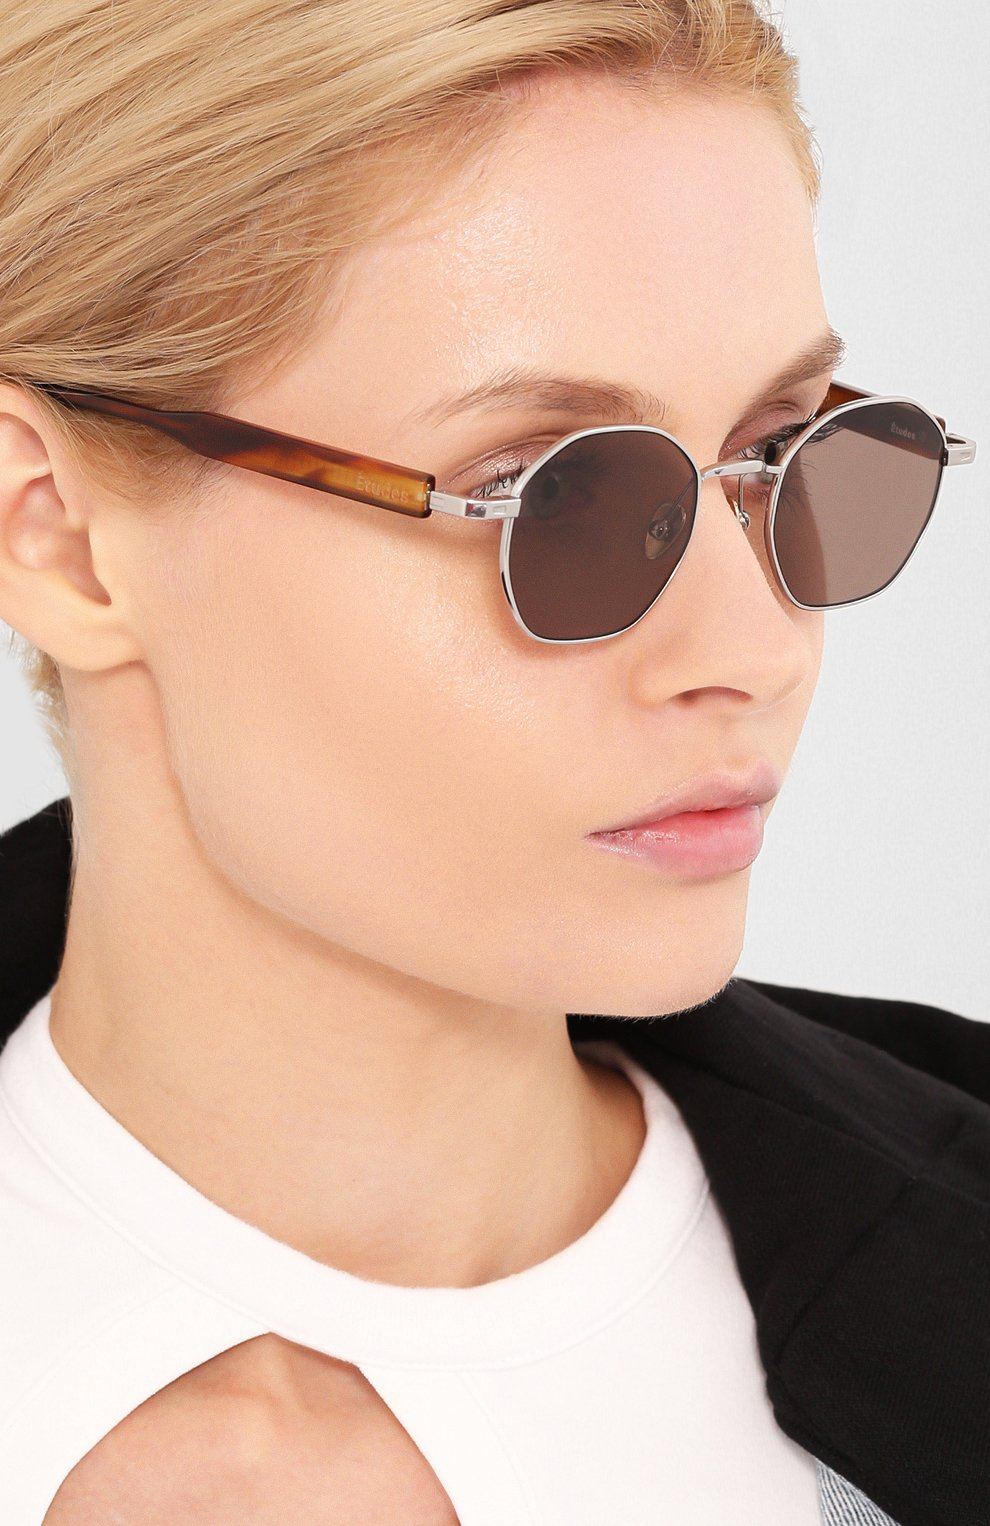 Женские солнцезащитные очки ÉTUDES серебряного цвета, арт. LIBERTE WHITE SILVER RT WITH CHAIN | Фото 2